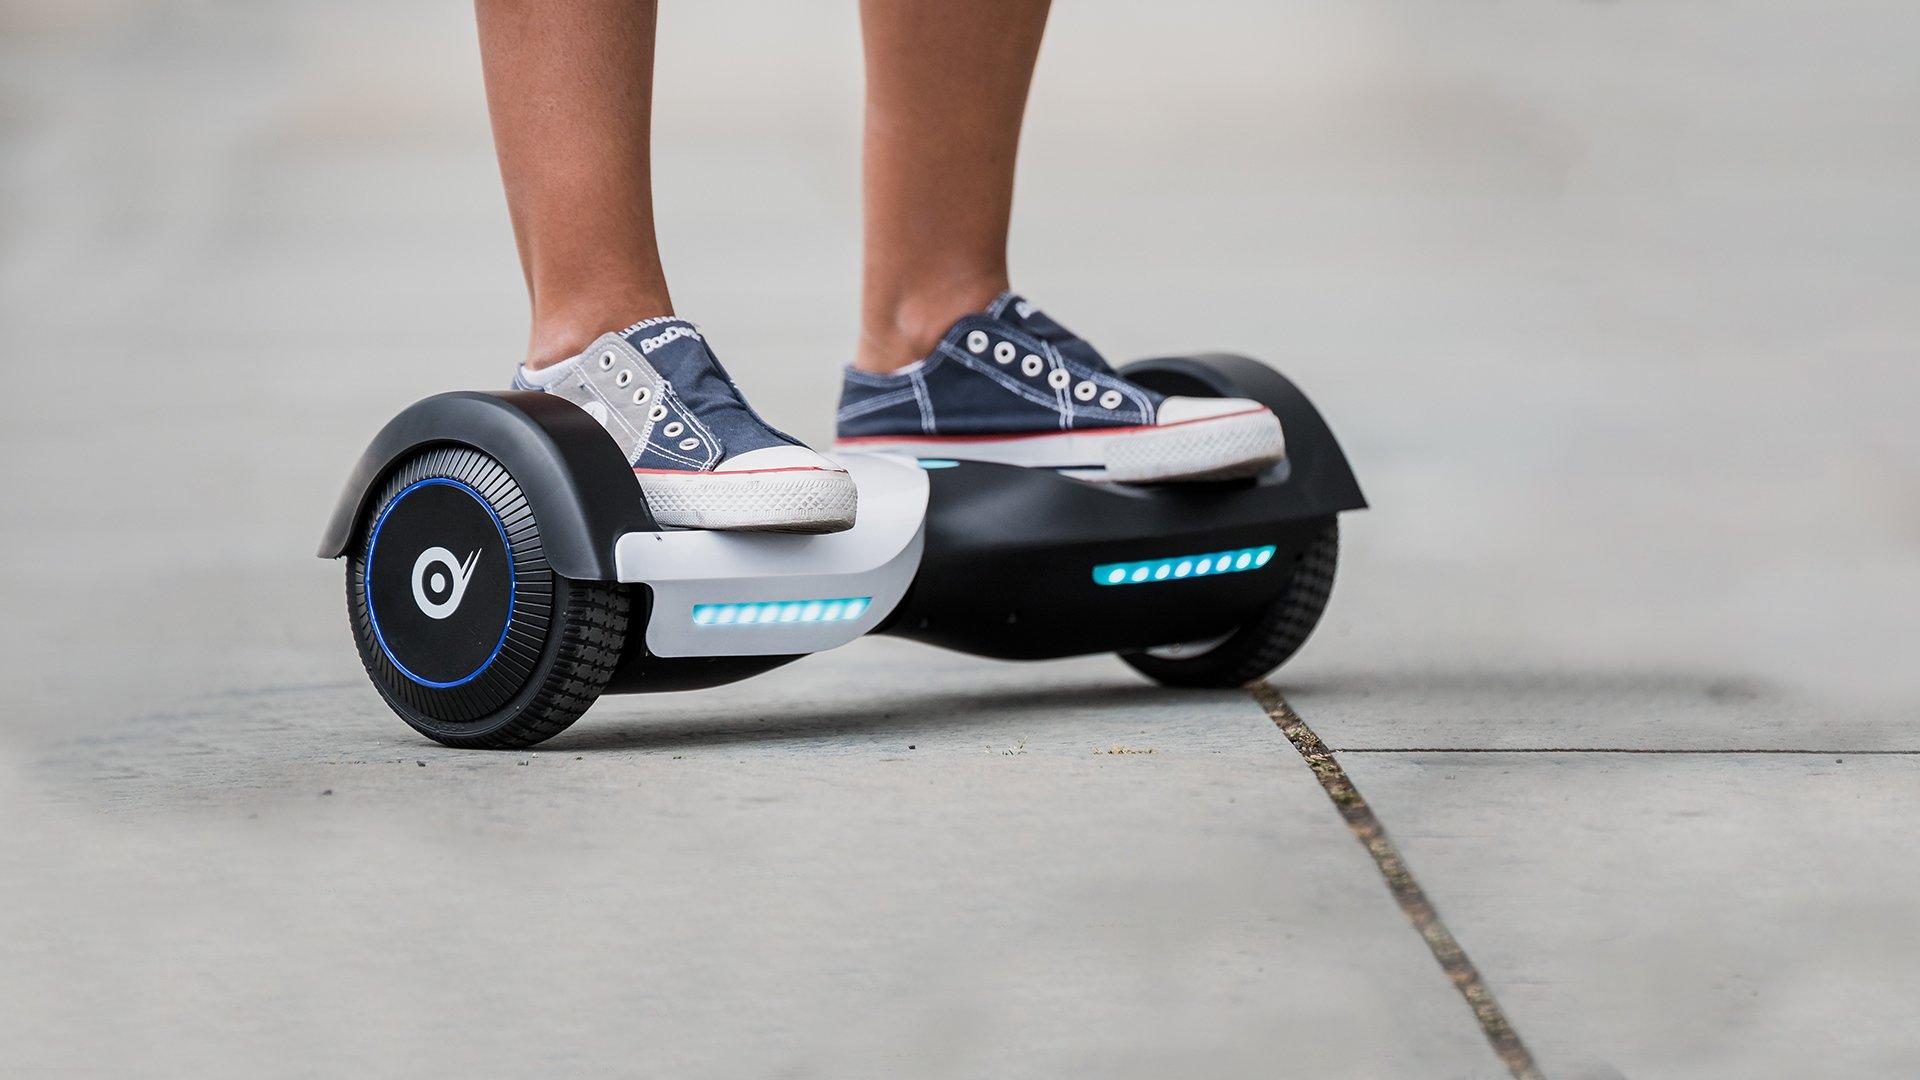 hx420 hoverboard 6 5 zoll online bestellen bluewheel. Black Bedroom Furniture Sets. Home Design Ideas